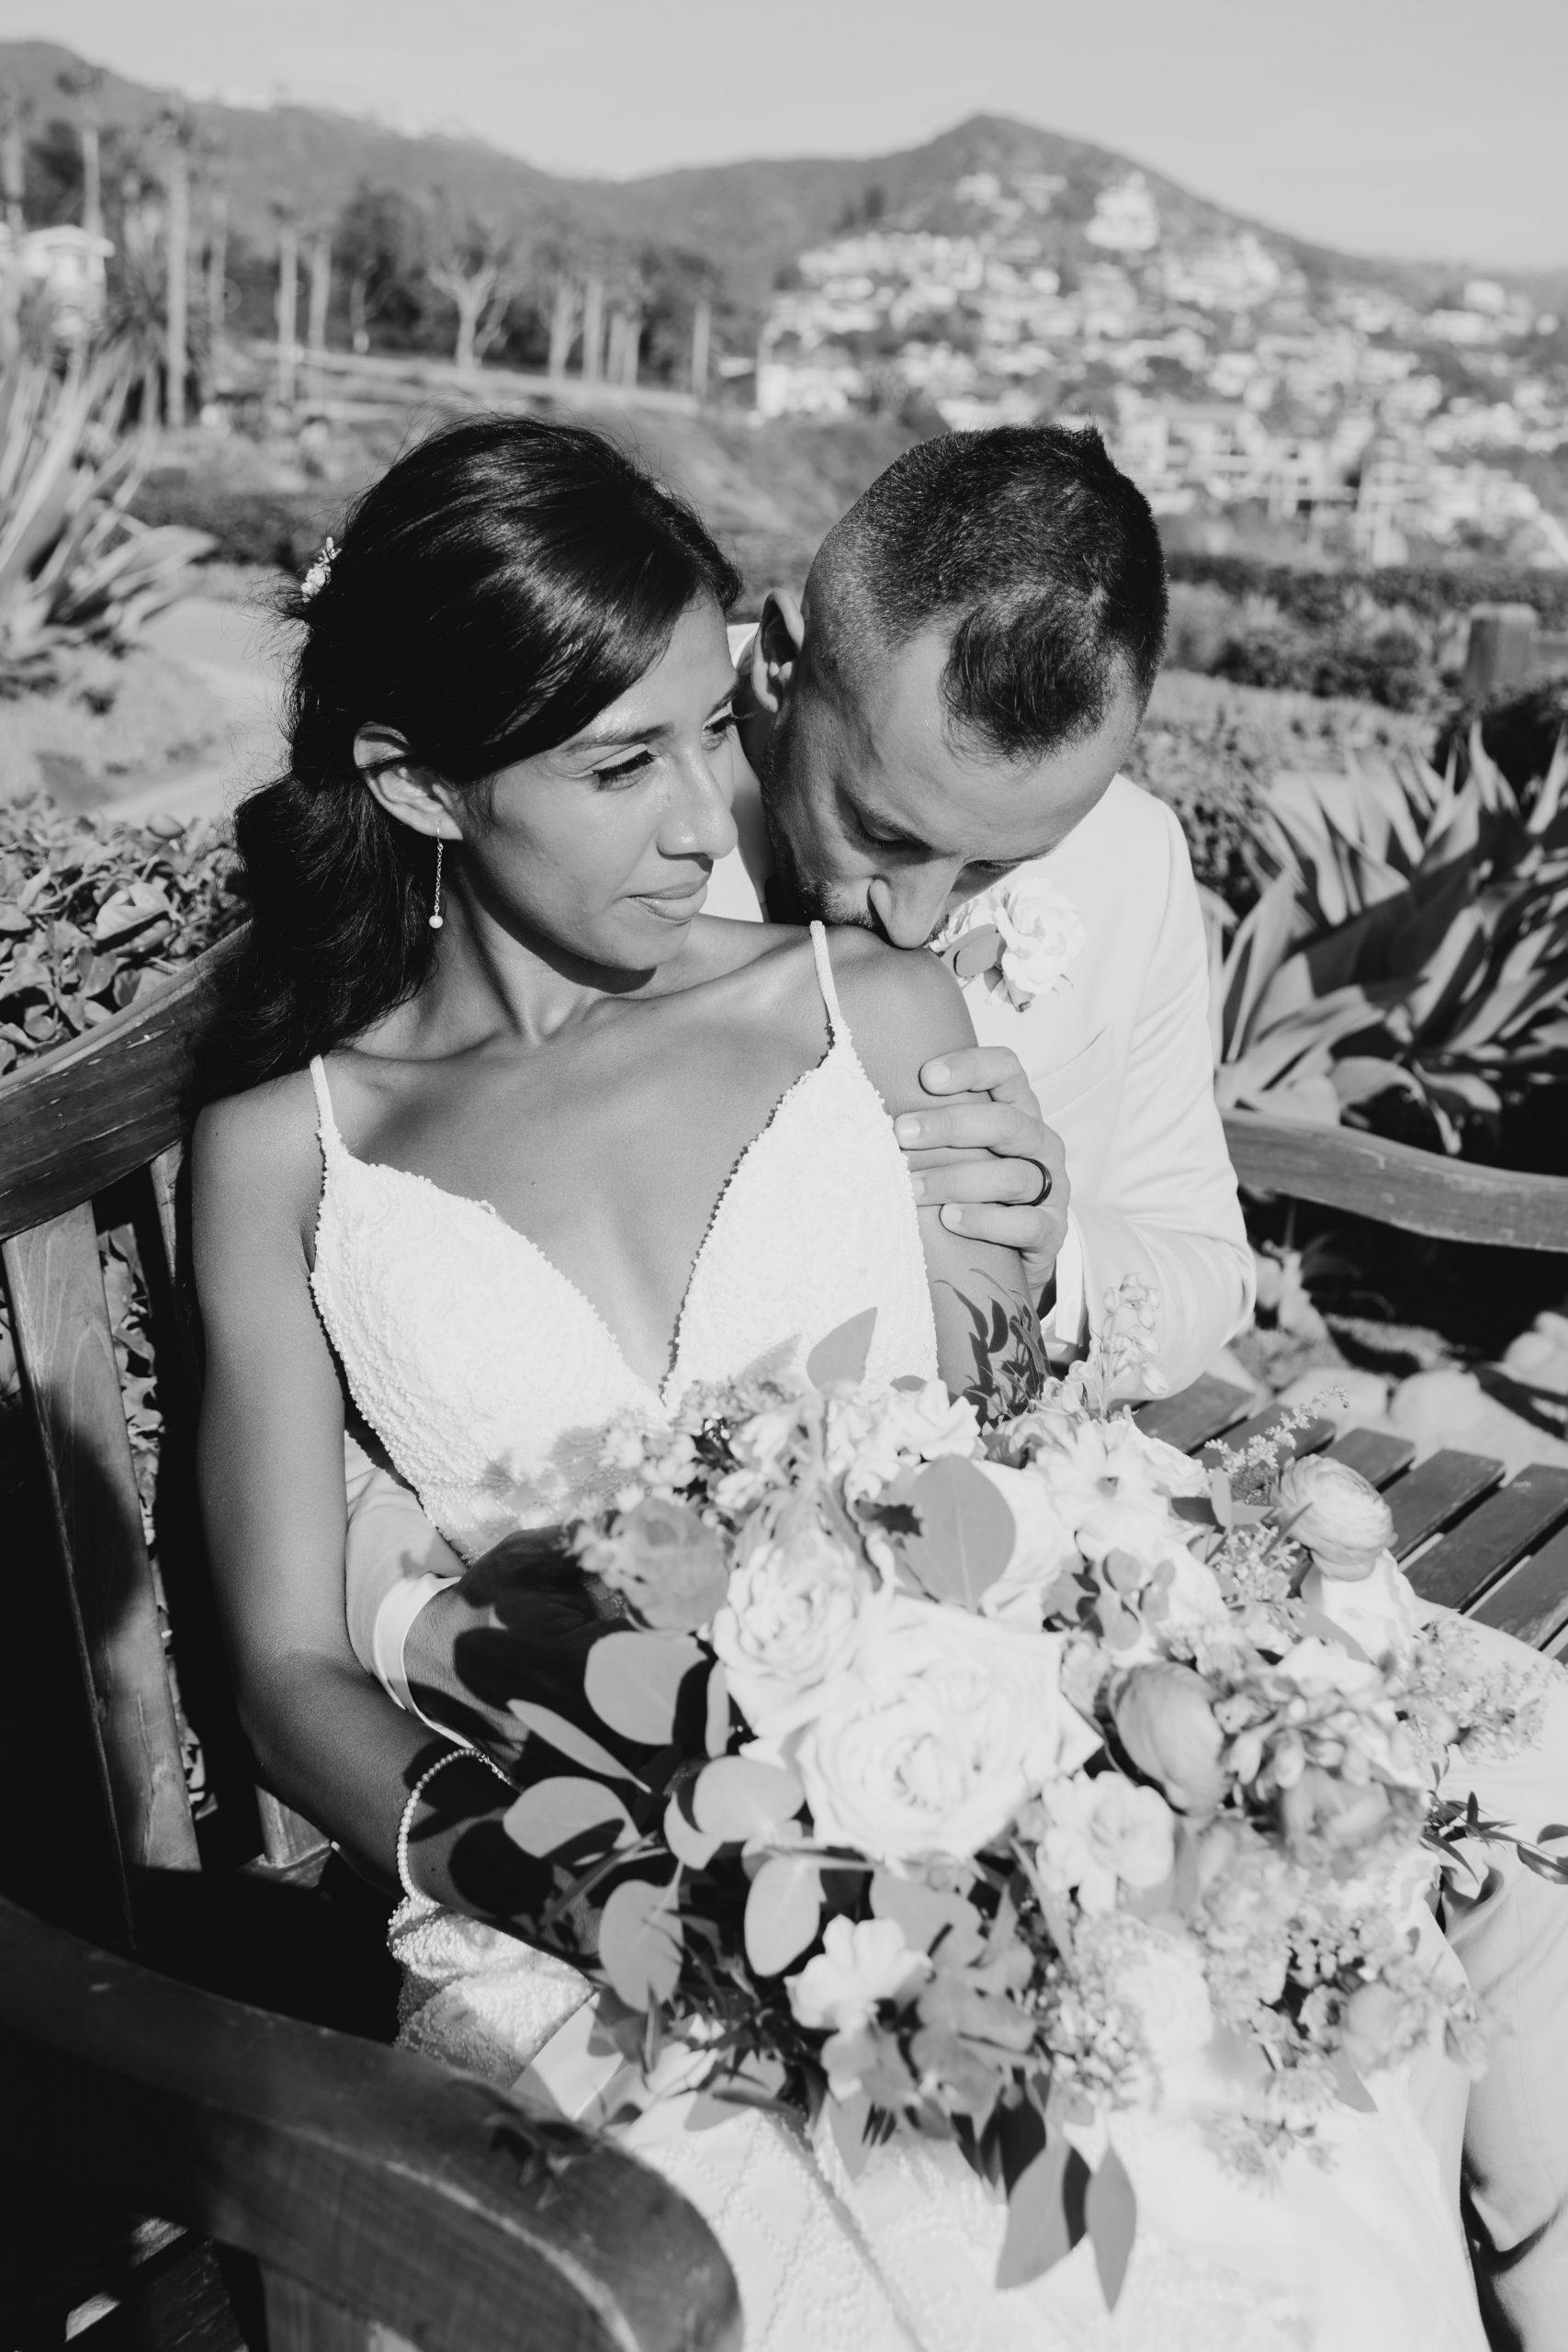 Black and White Bridal portrait, image by Fatima Elreda Photo